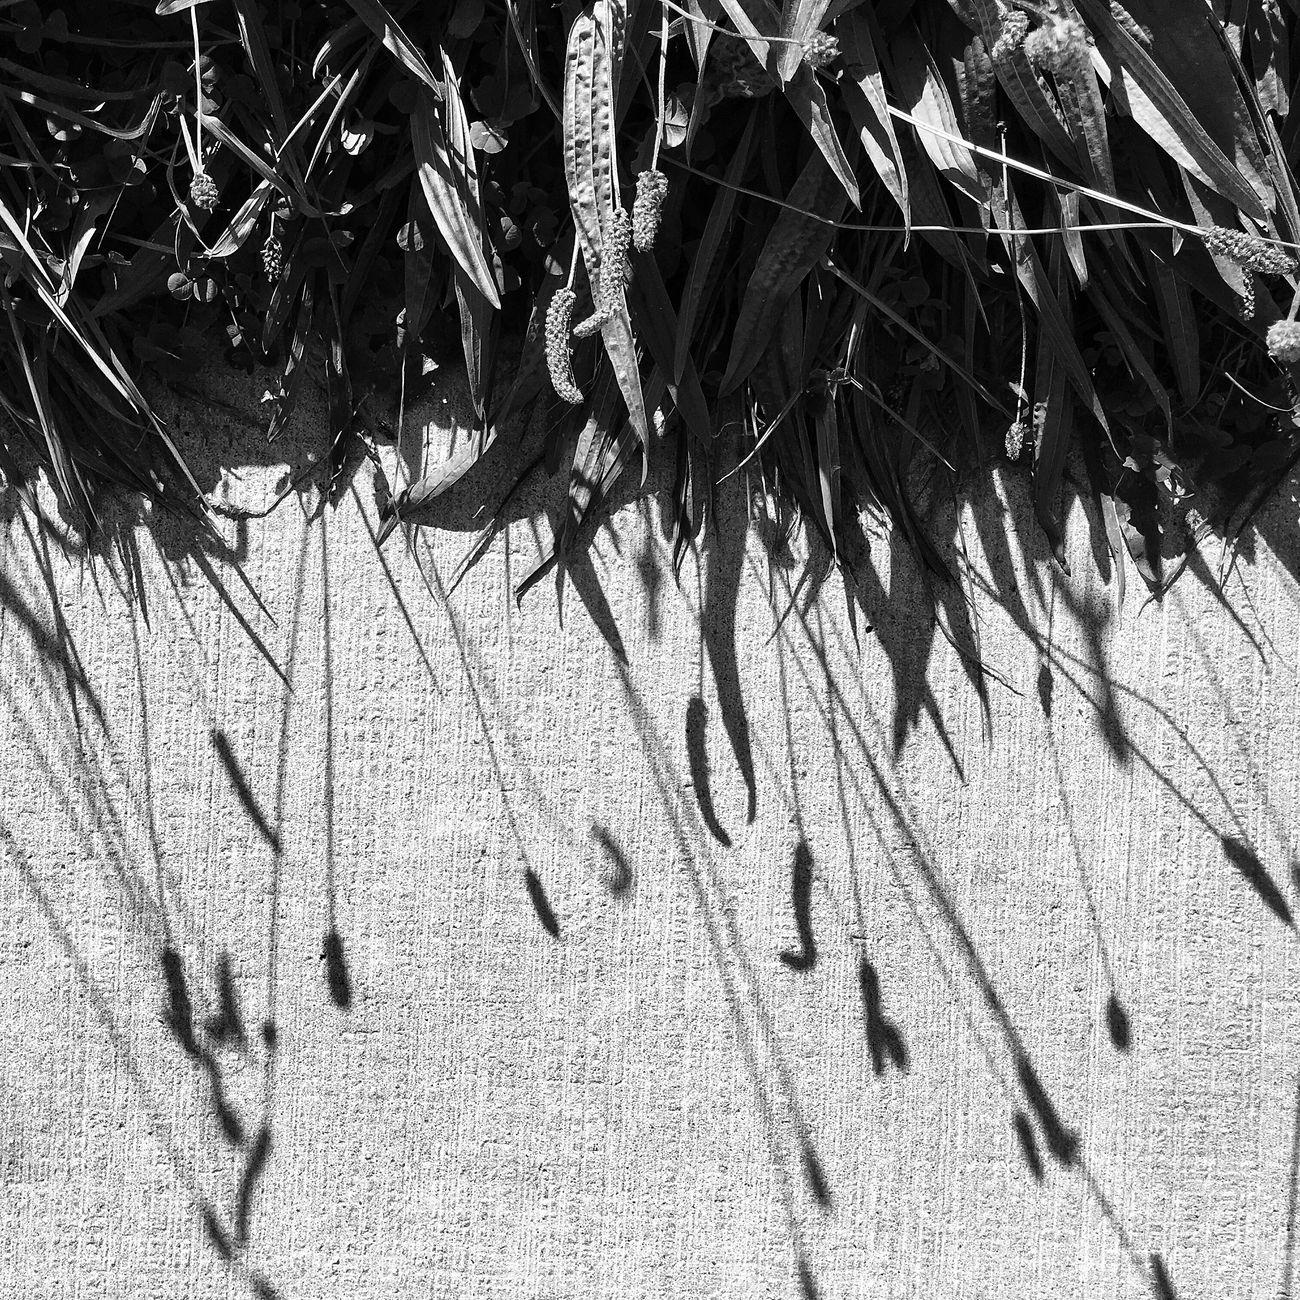 Black And White Blackandwhite Photography Monochrome Blackandwhite Dutch Landscape Nature Photography Nature_collection Dutch Countyside